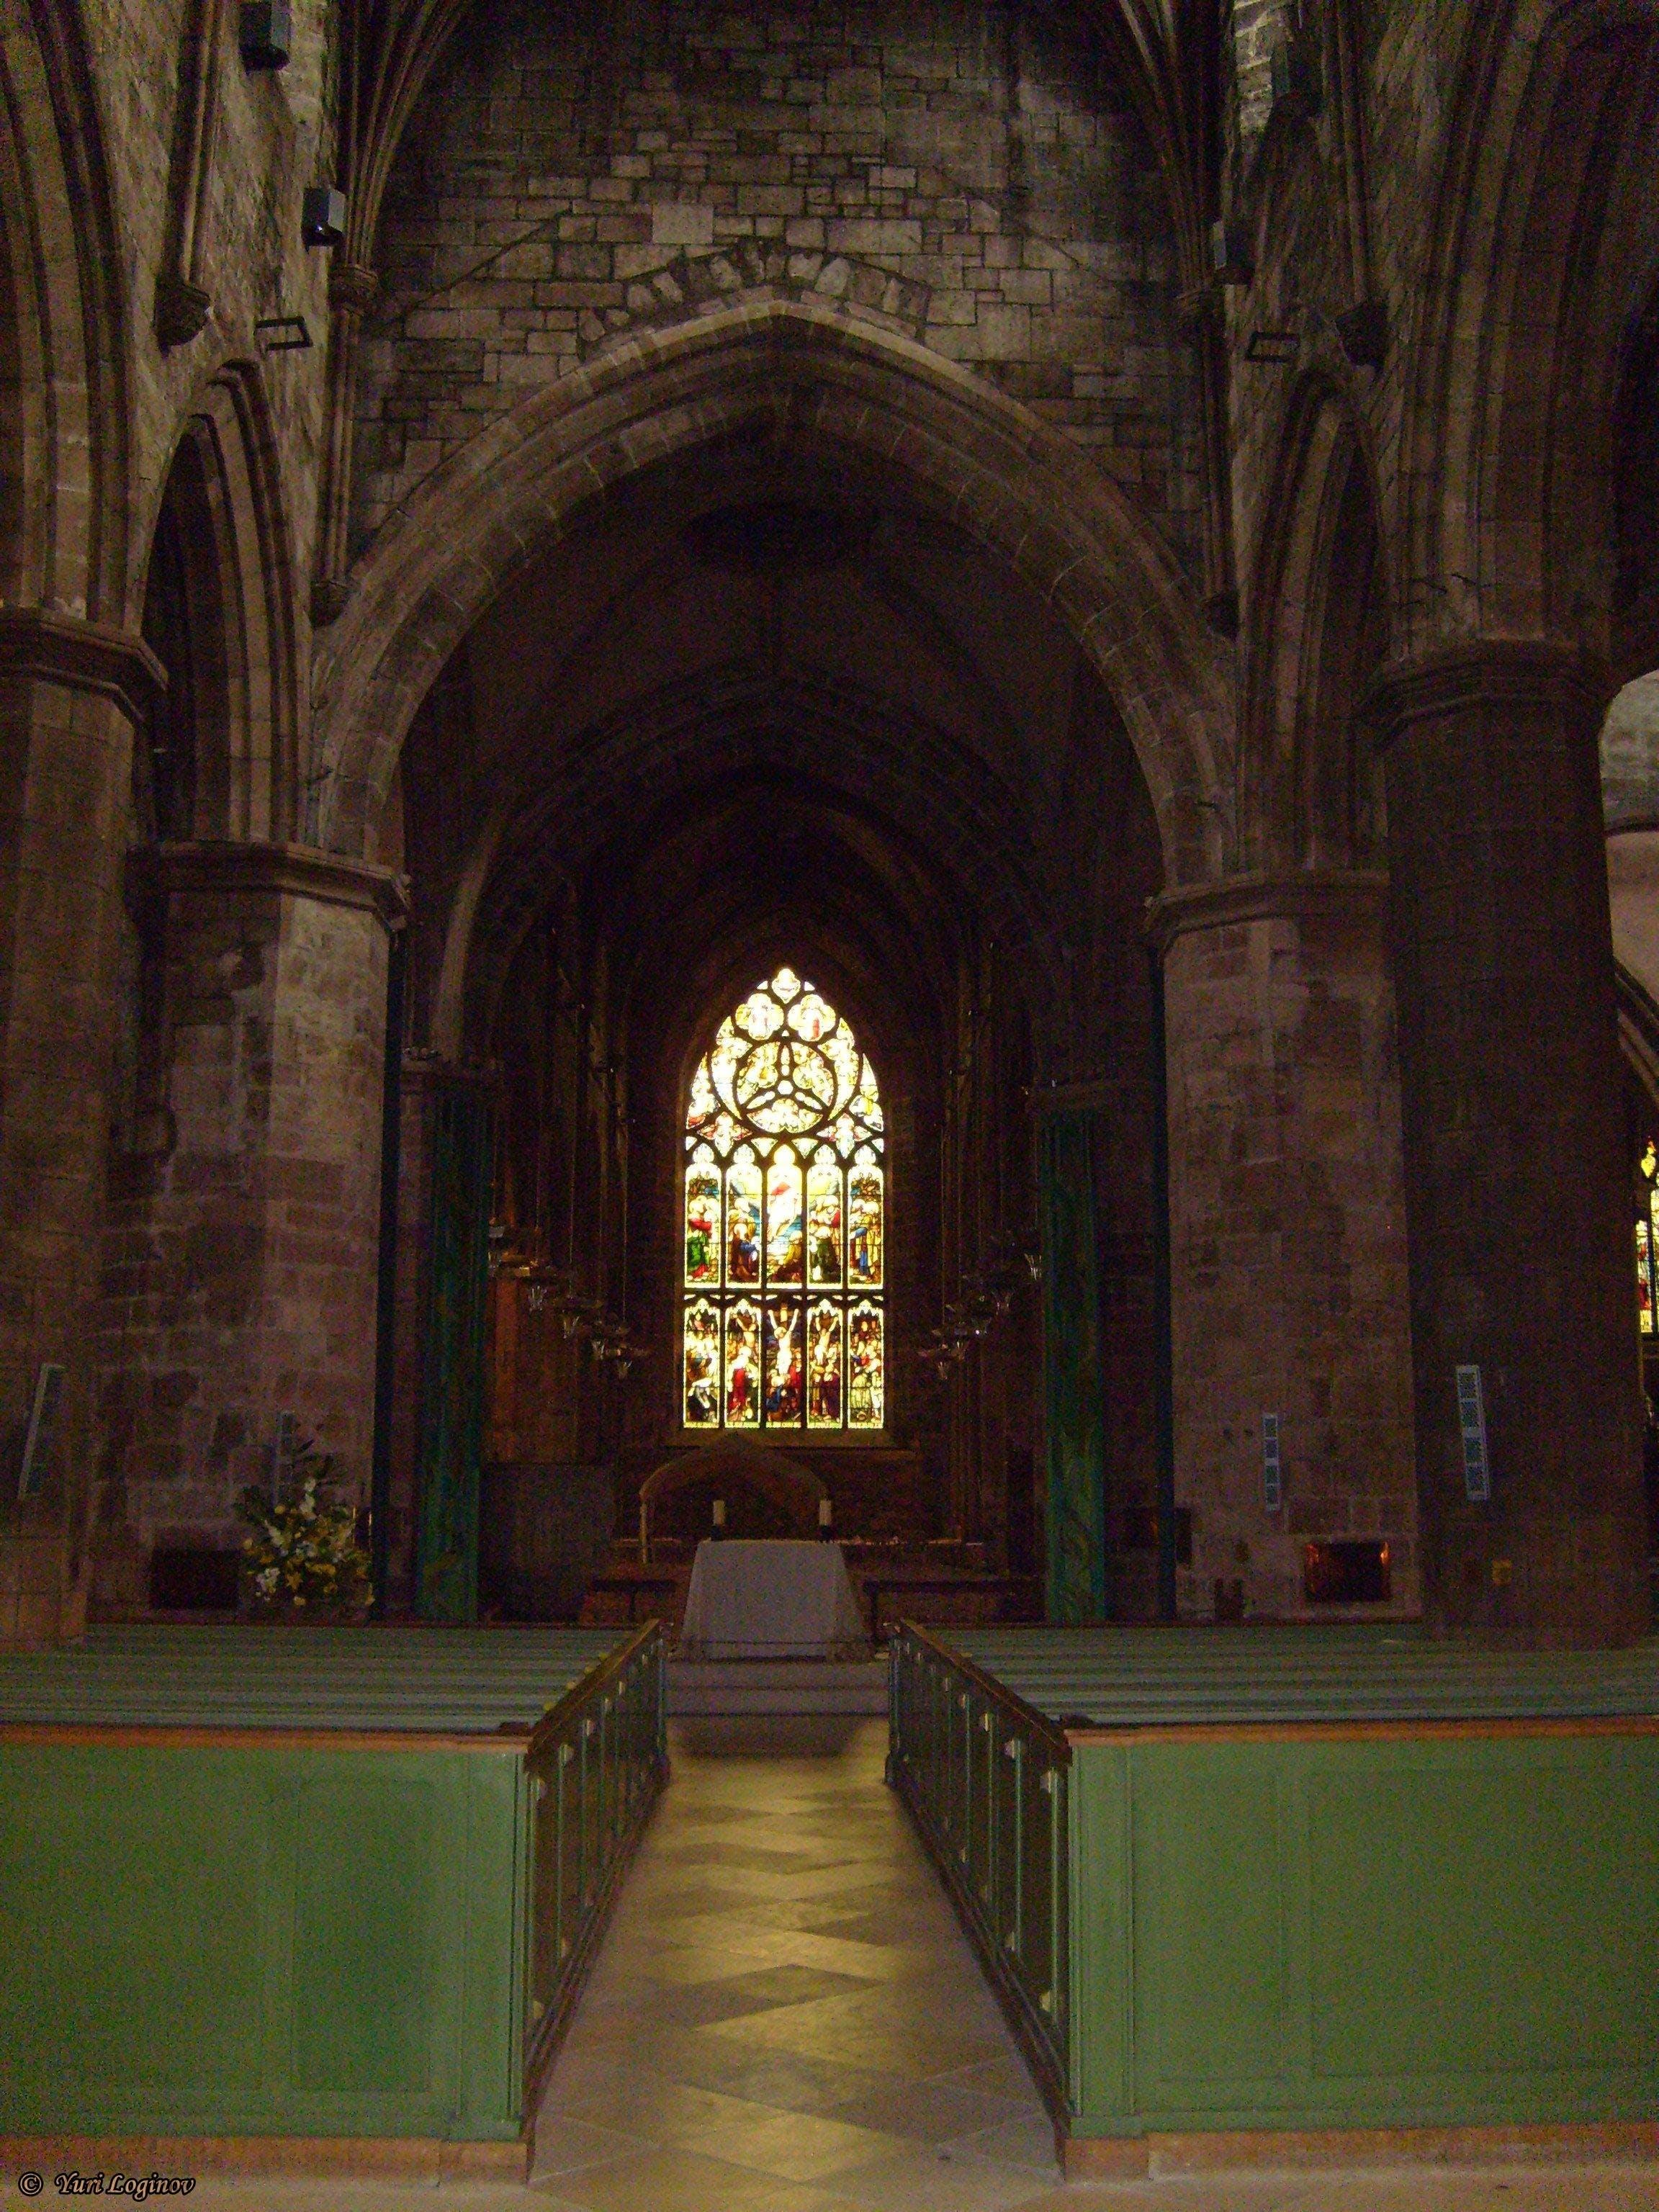 Free stock photo of scotland, edinburgh, united kingdom, Saint Giest's Cathedral